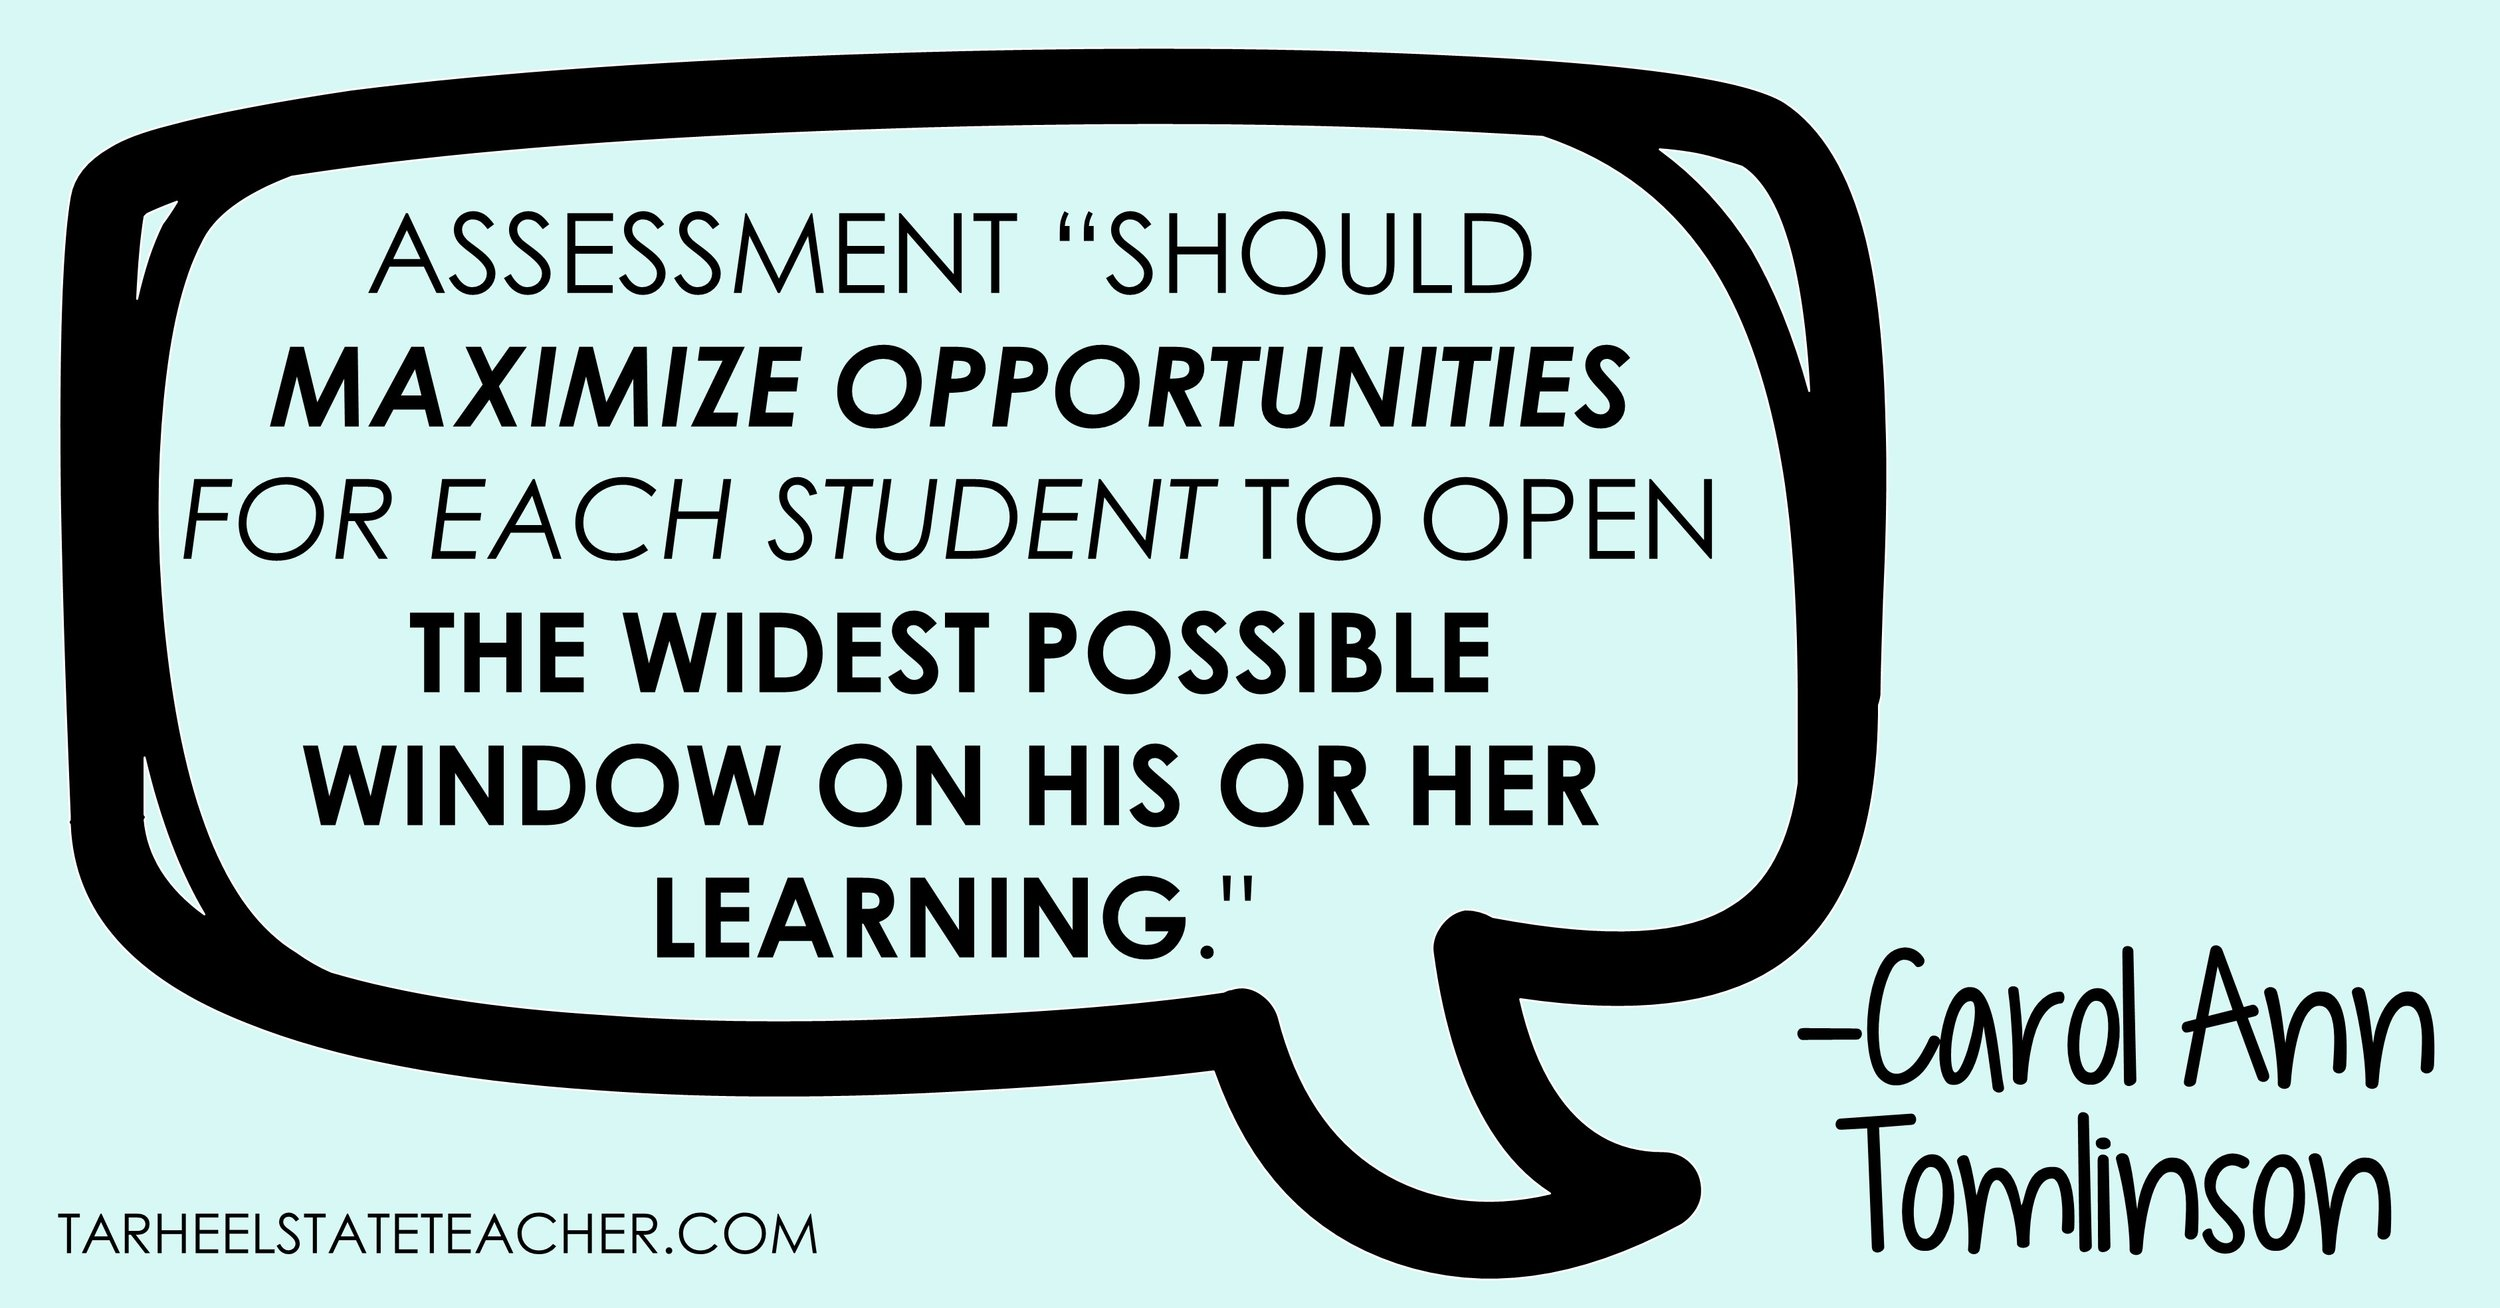 assessment should maximize learning tomlinson.jpg